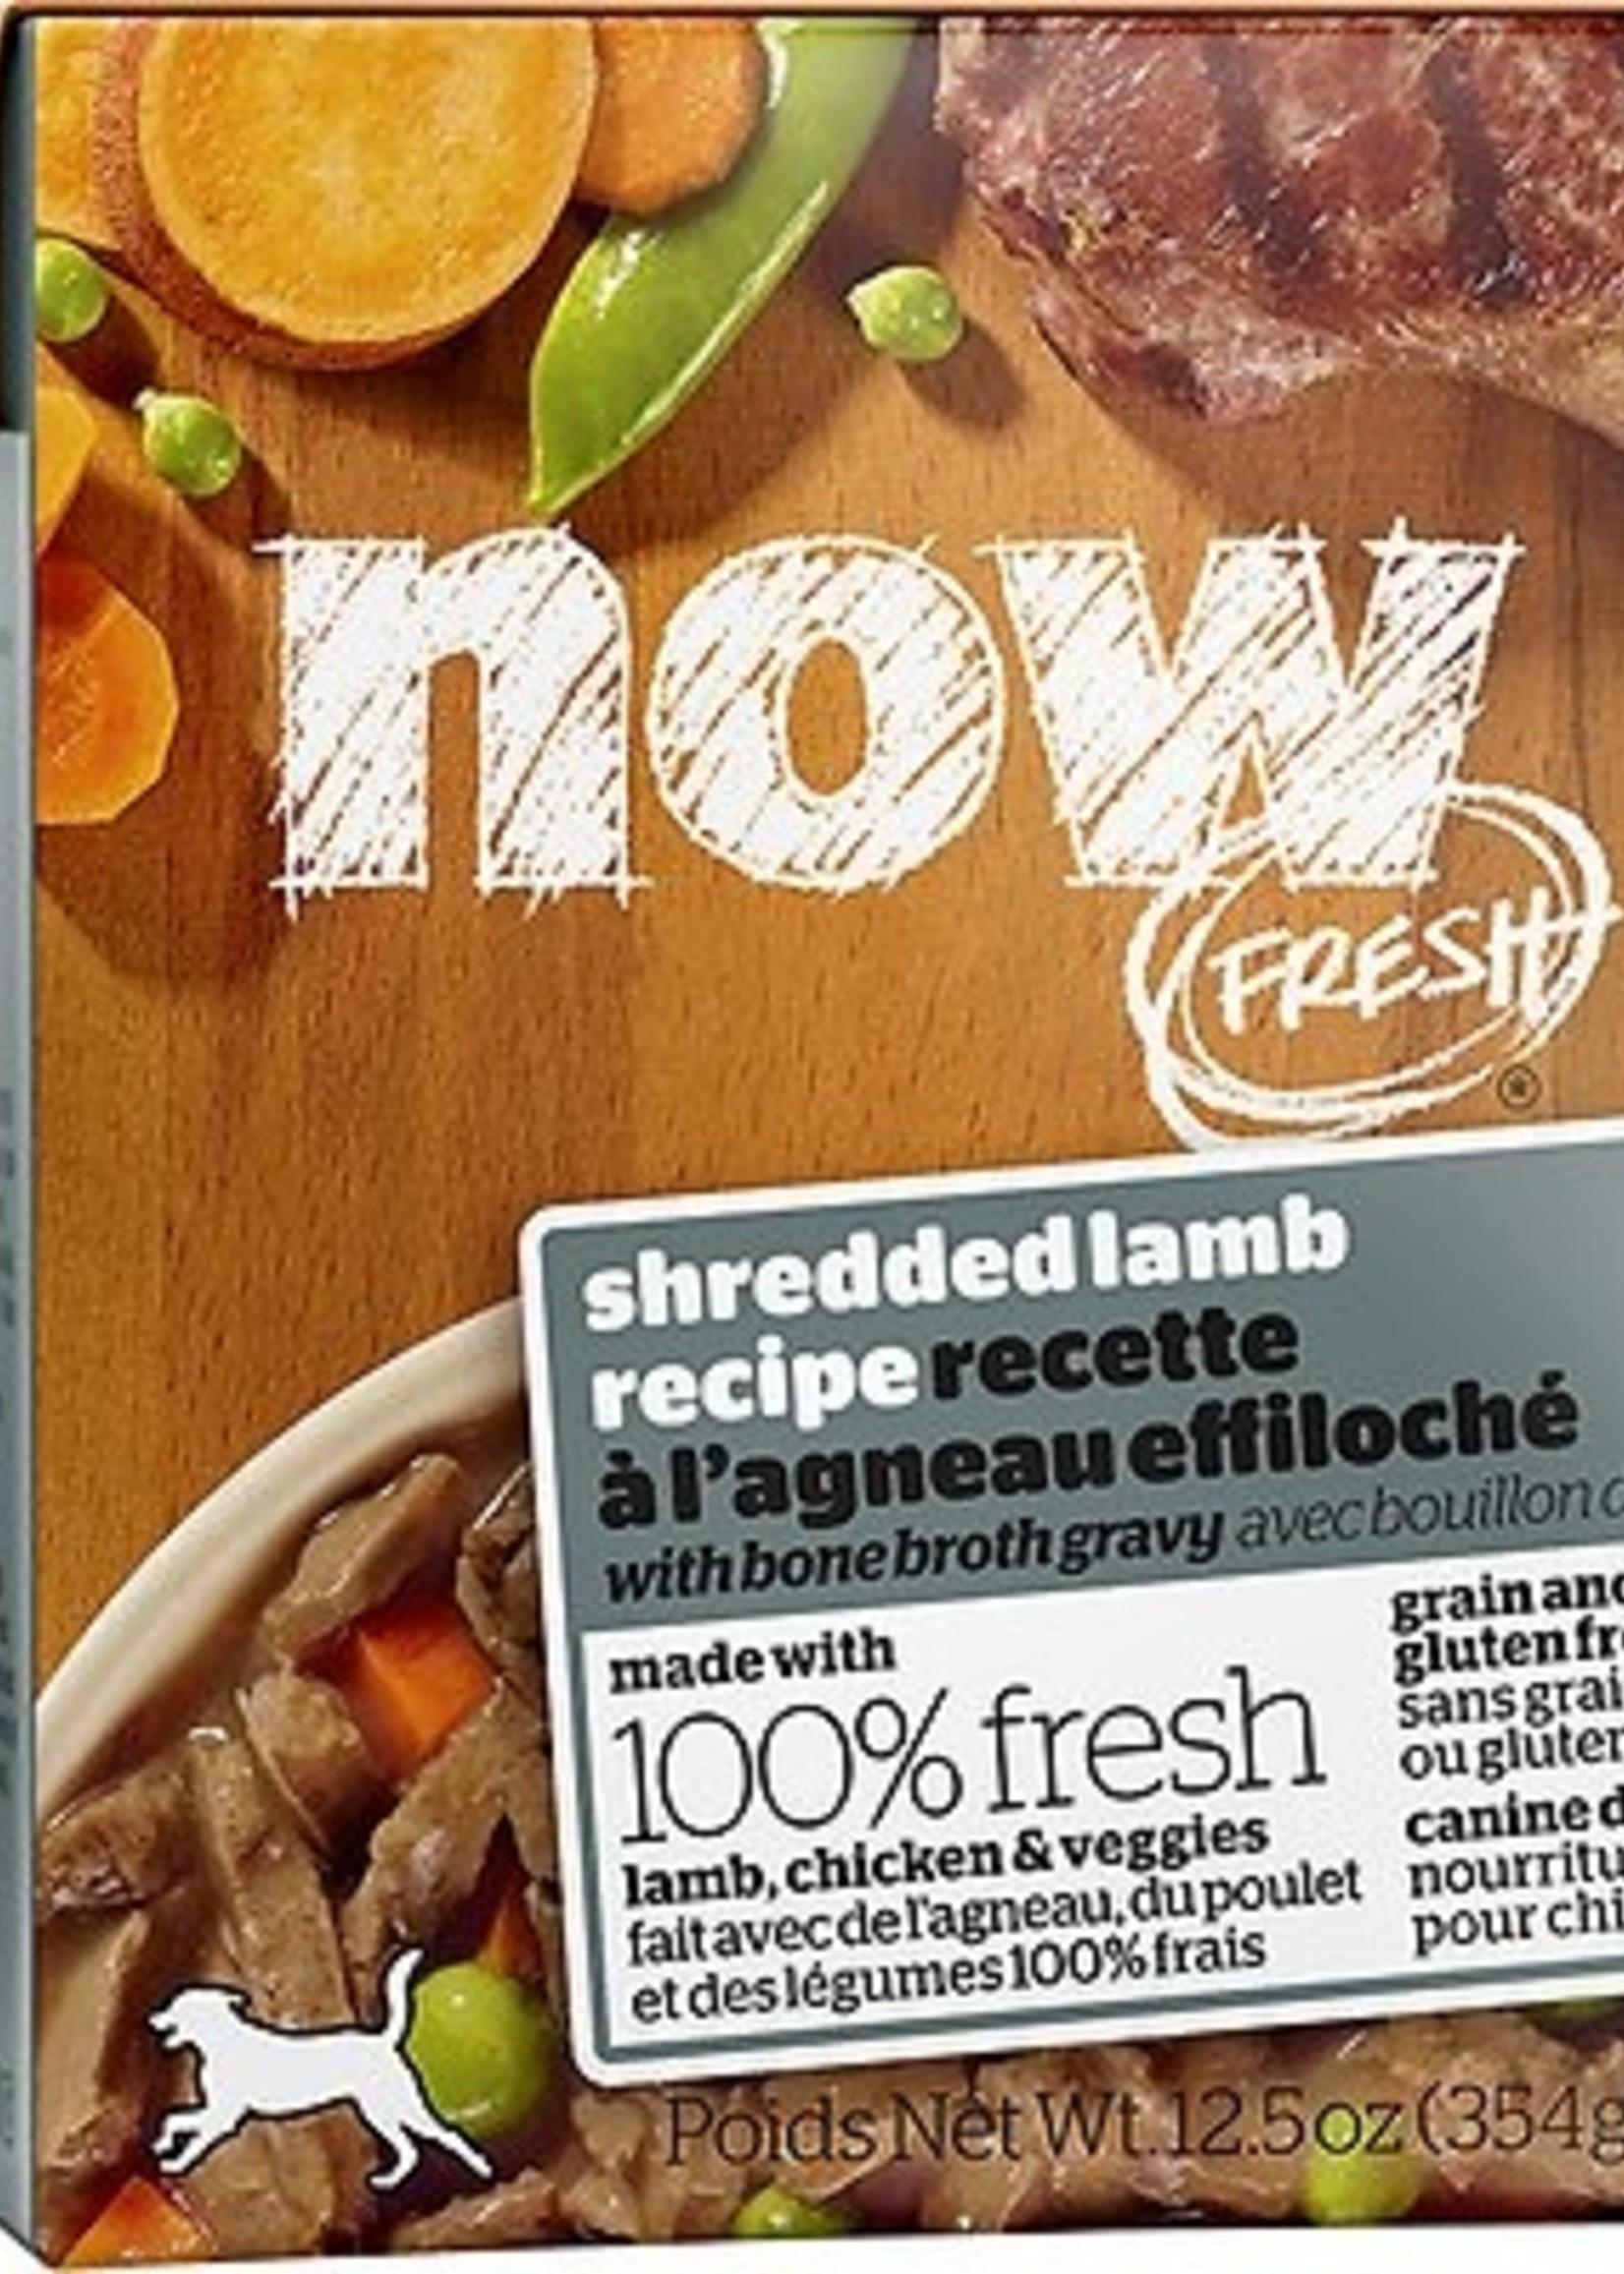 Petcurean Now! Shredded Lamb 12.5 oz